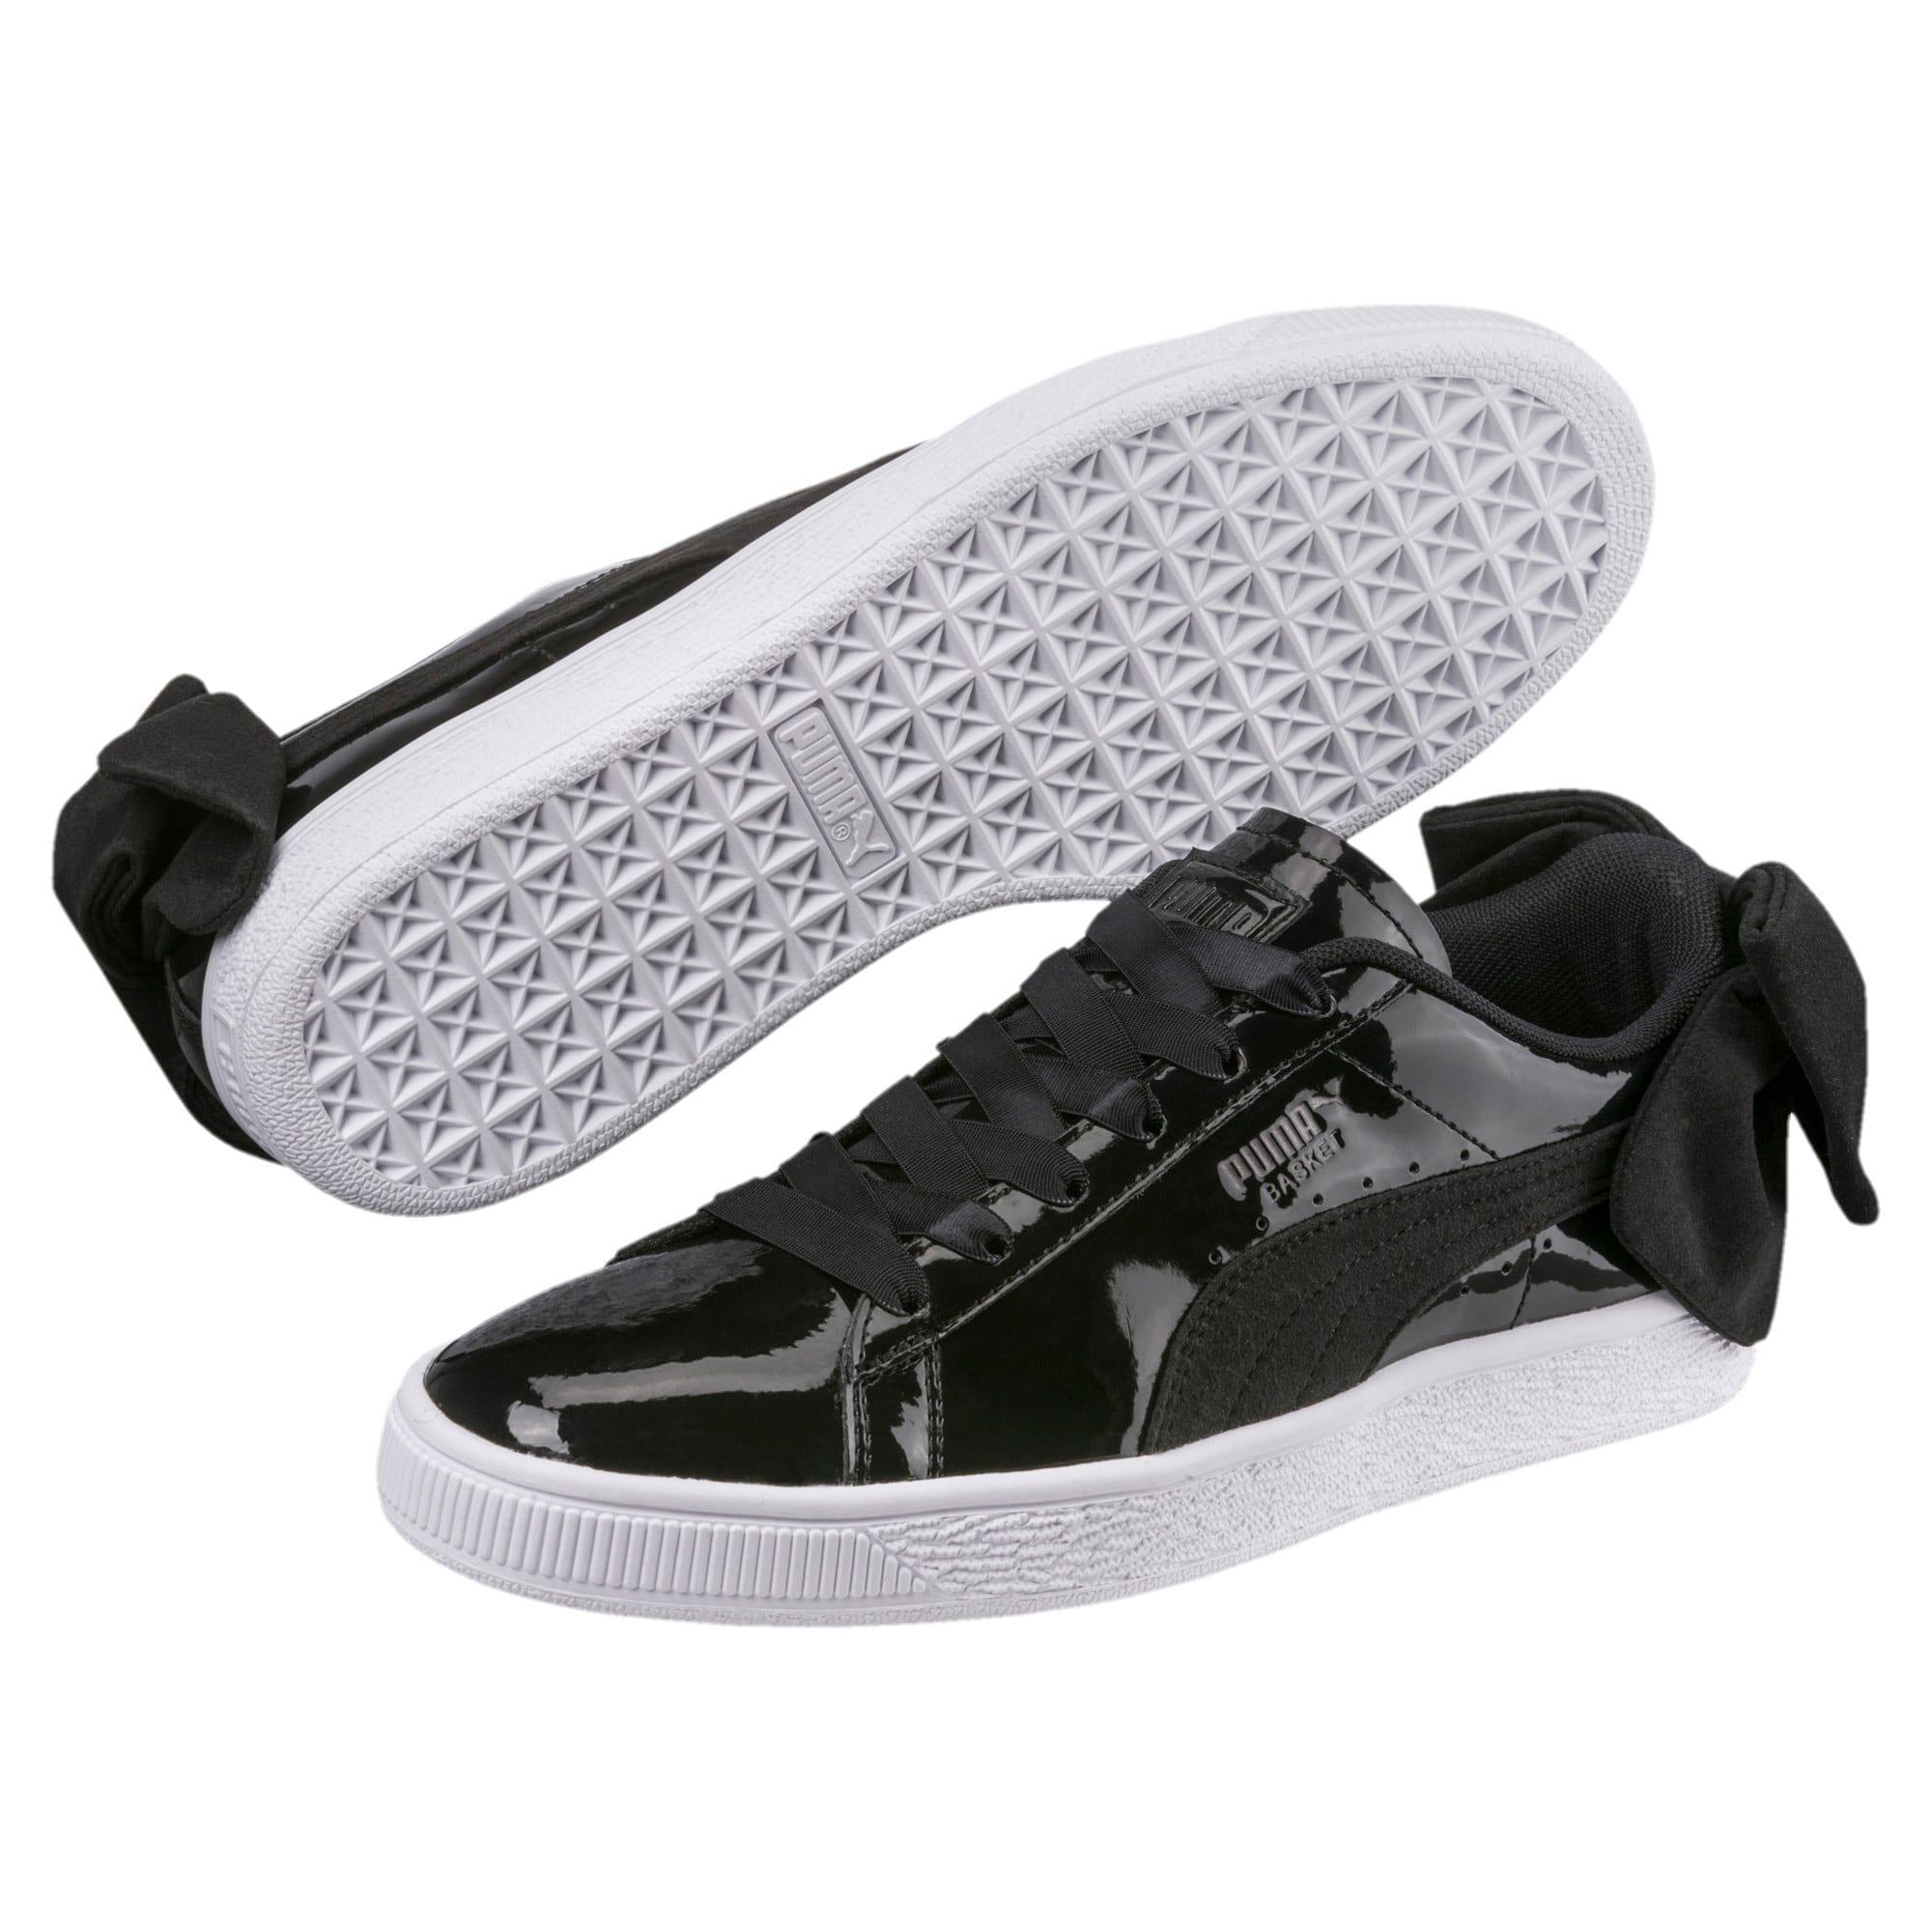 Thumbnail 2 of Basket Suede Bow Women's Sneakers, Puma Black-Puma Black, medium